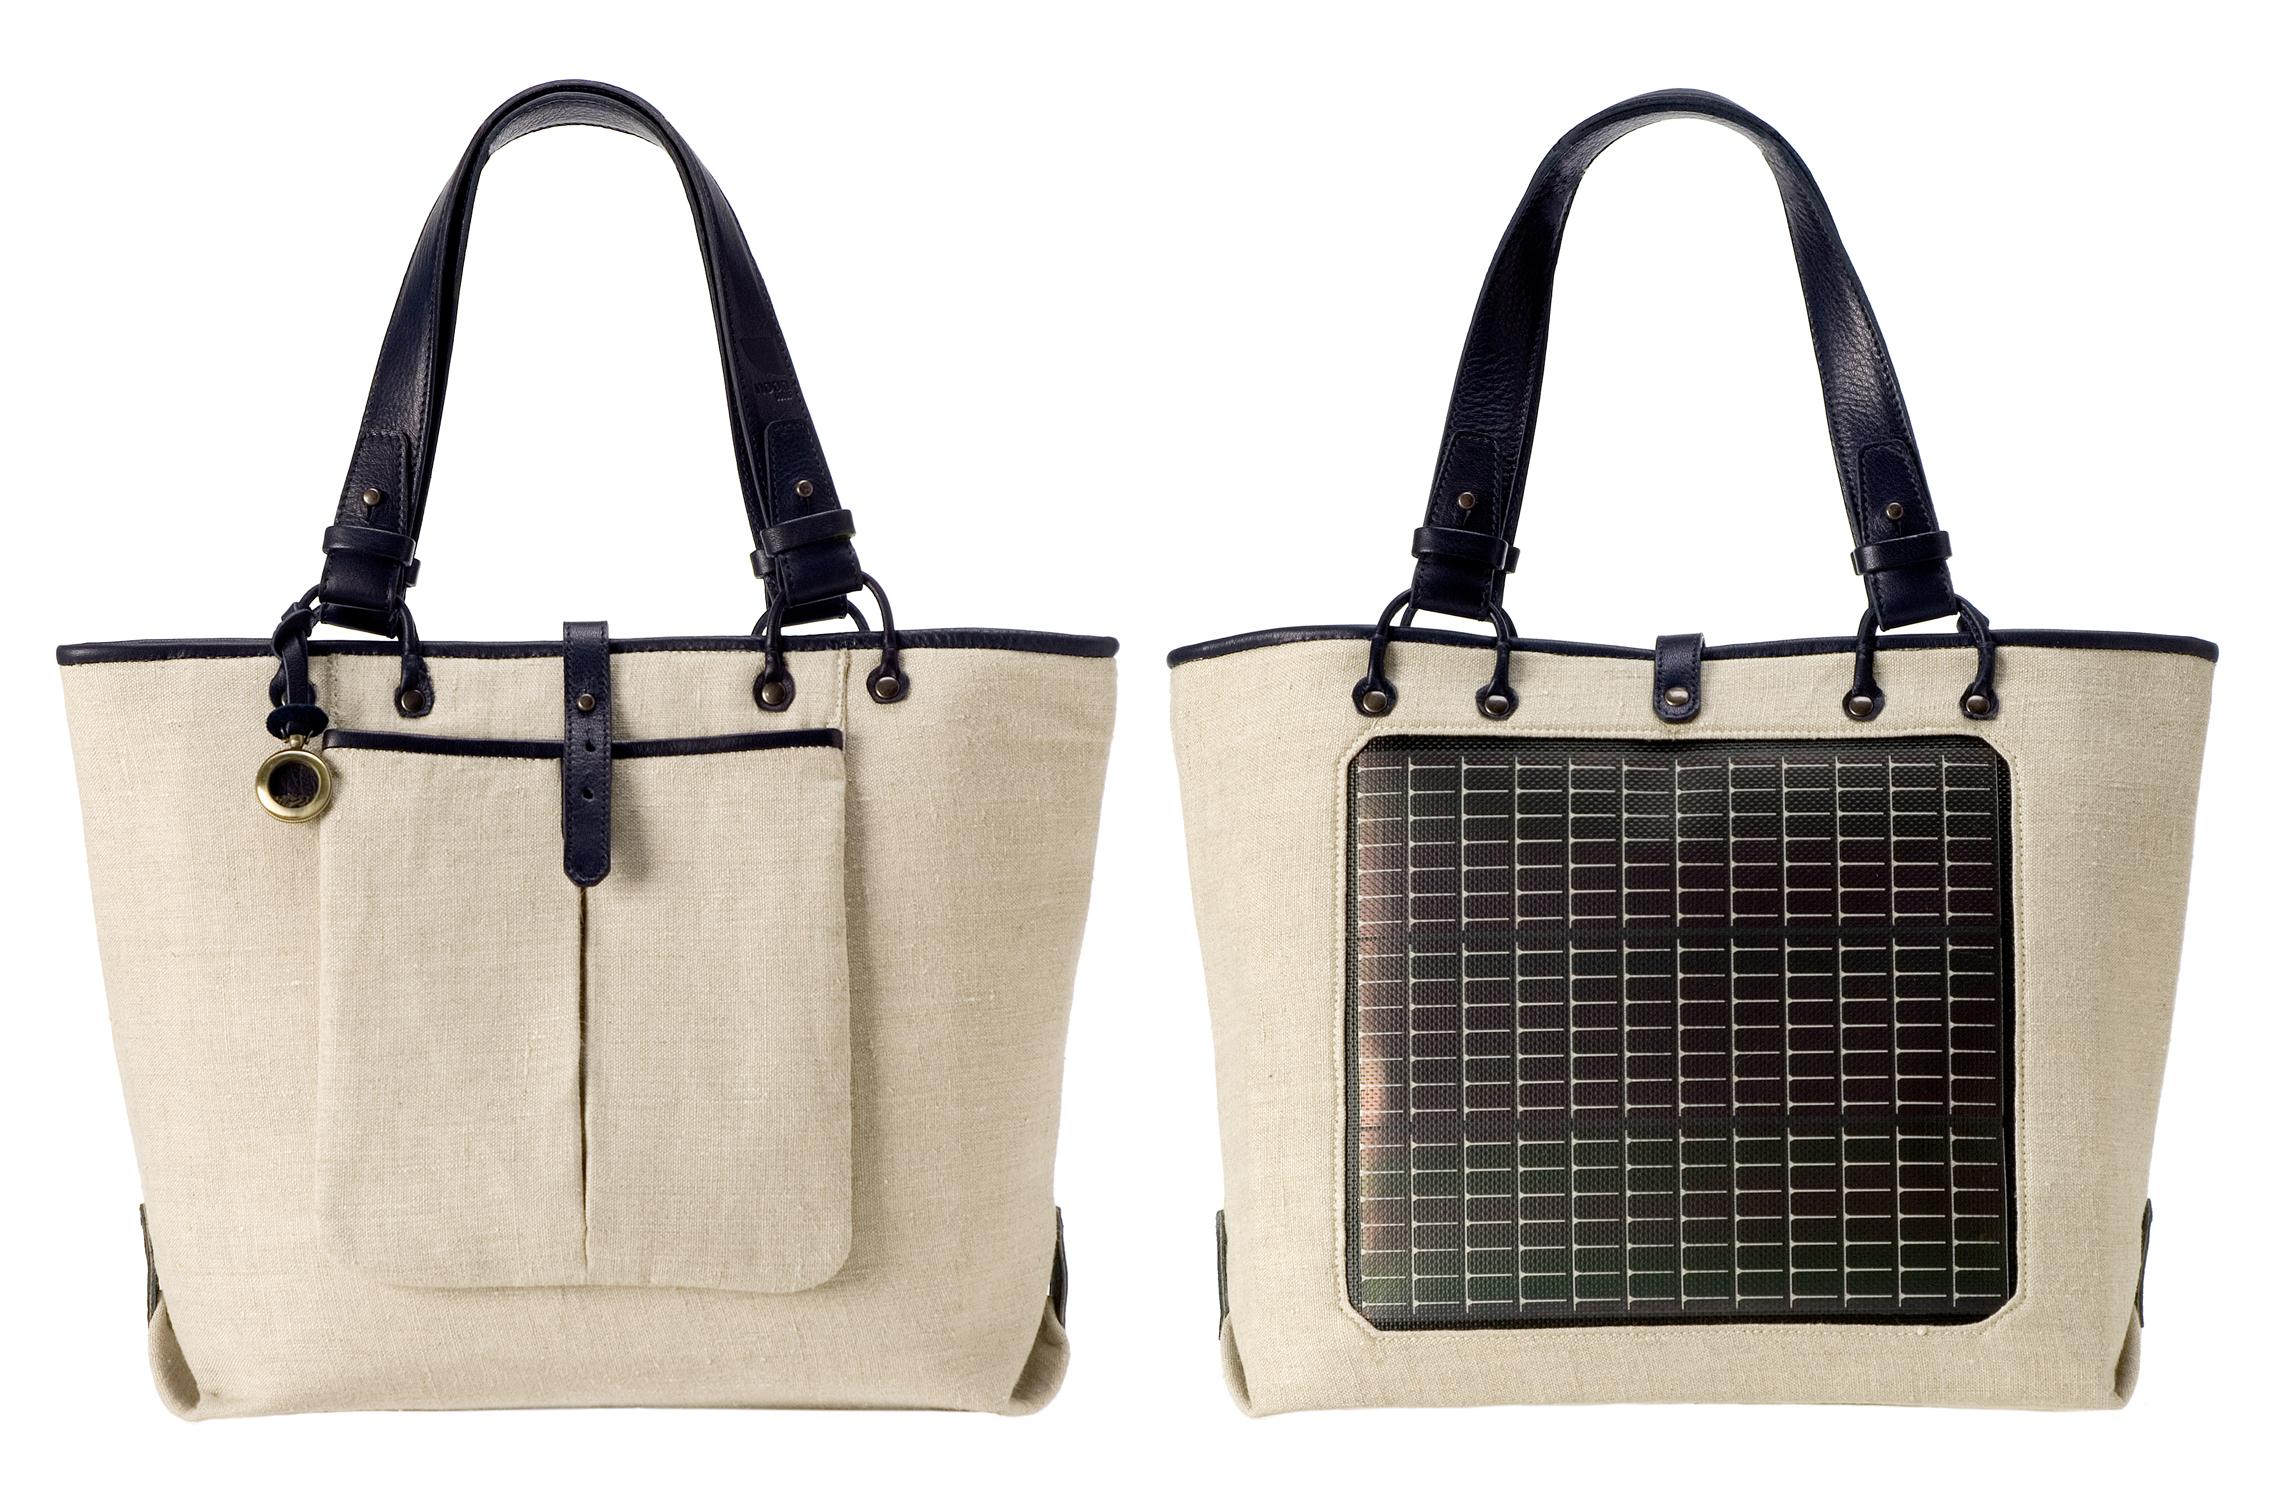 Noon Solar Launches Fall '08 Solar-Powered Handbag Line ...